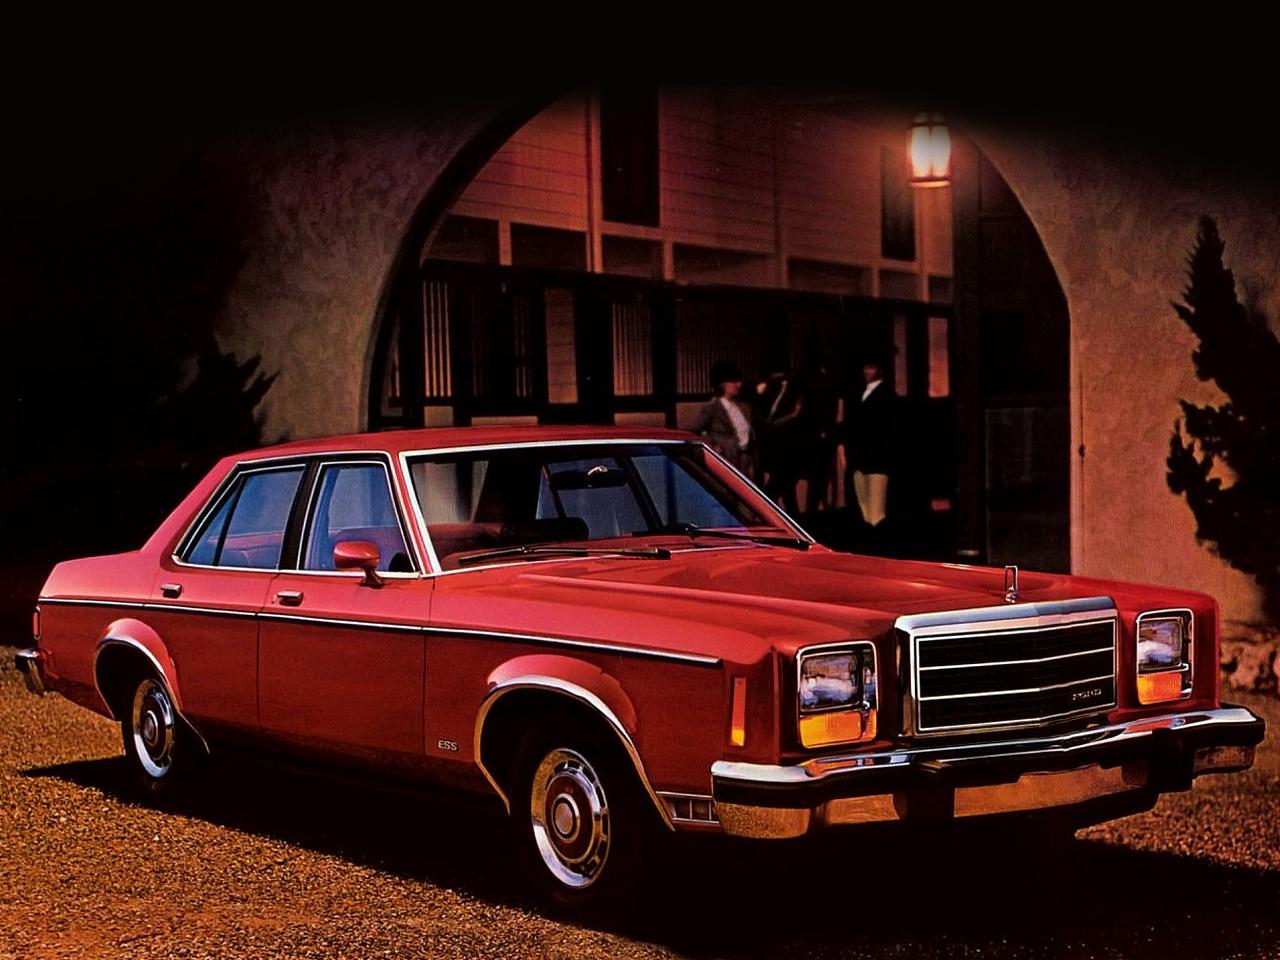 форд гранада 1980 фото